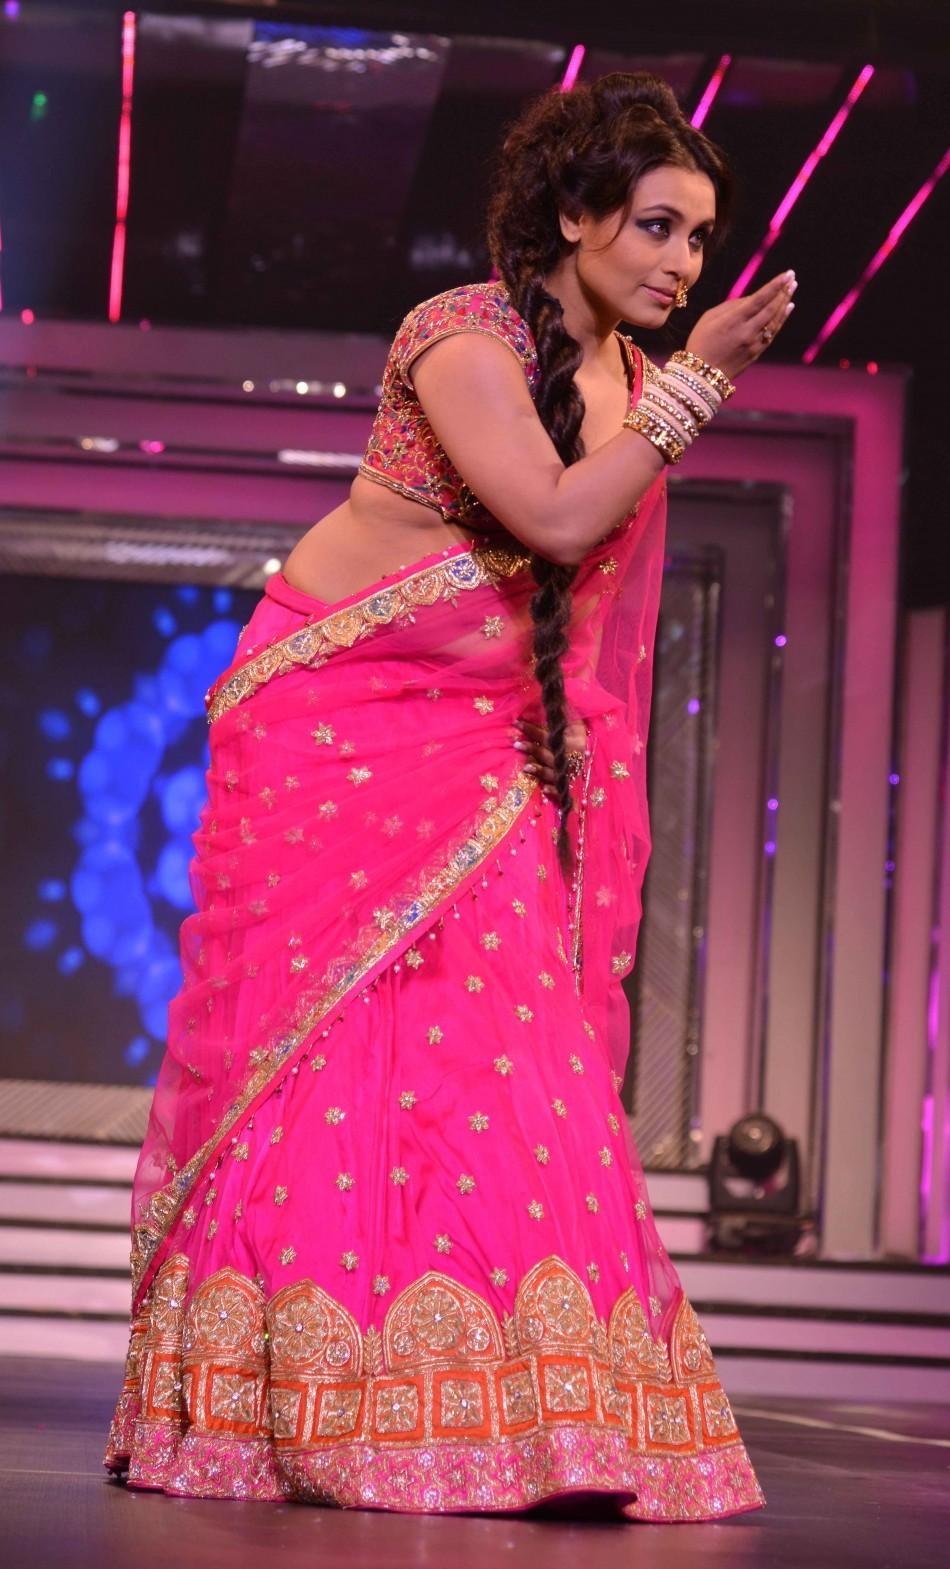 Rani Mukherjee (varinder chawla)